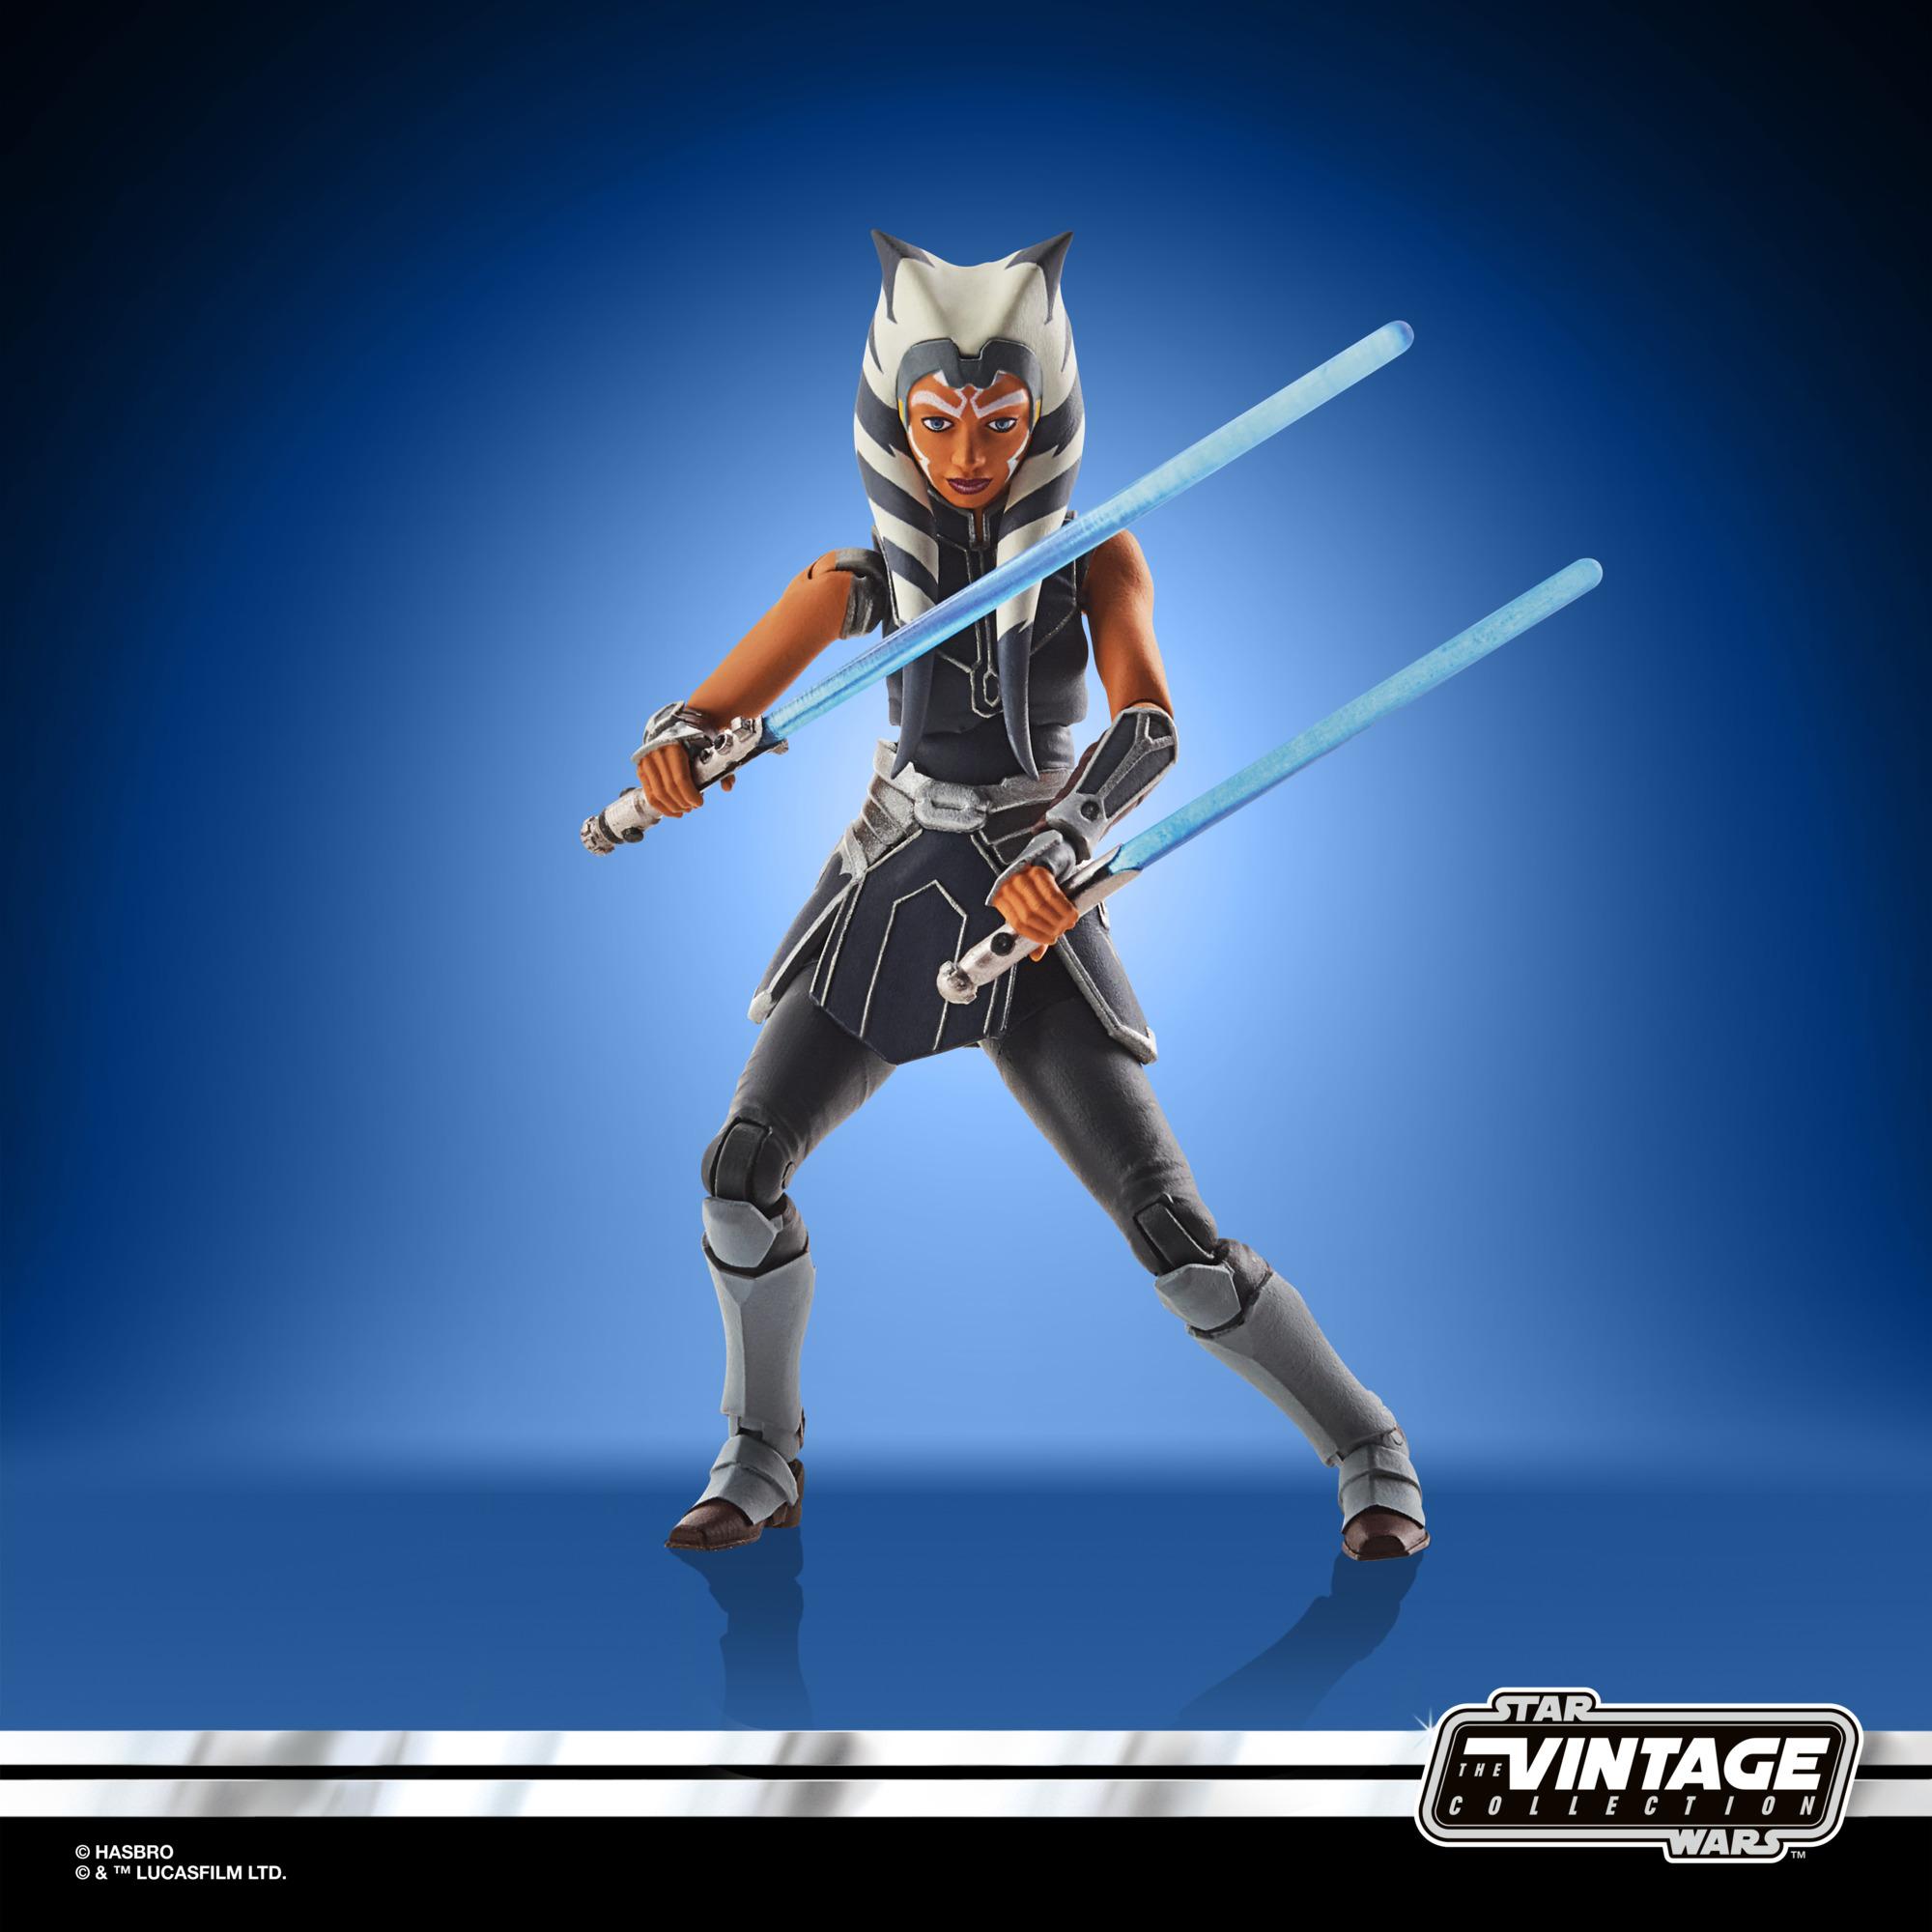 Hasbro Star Wars VINTAGE S3 Figures Assortment (4) Wave 7 E77635L05 5010993736898